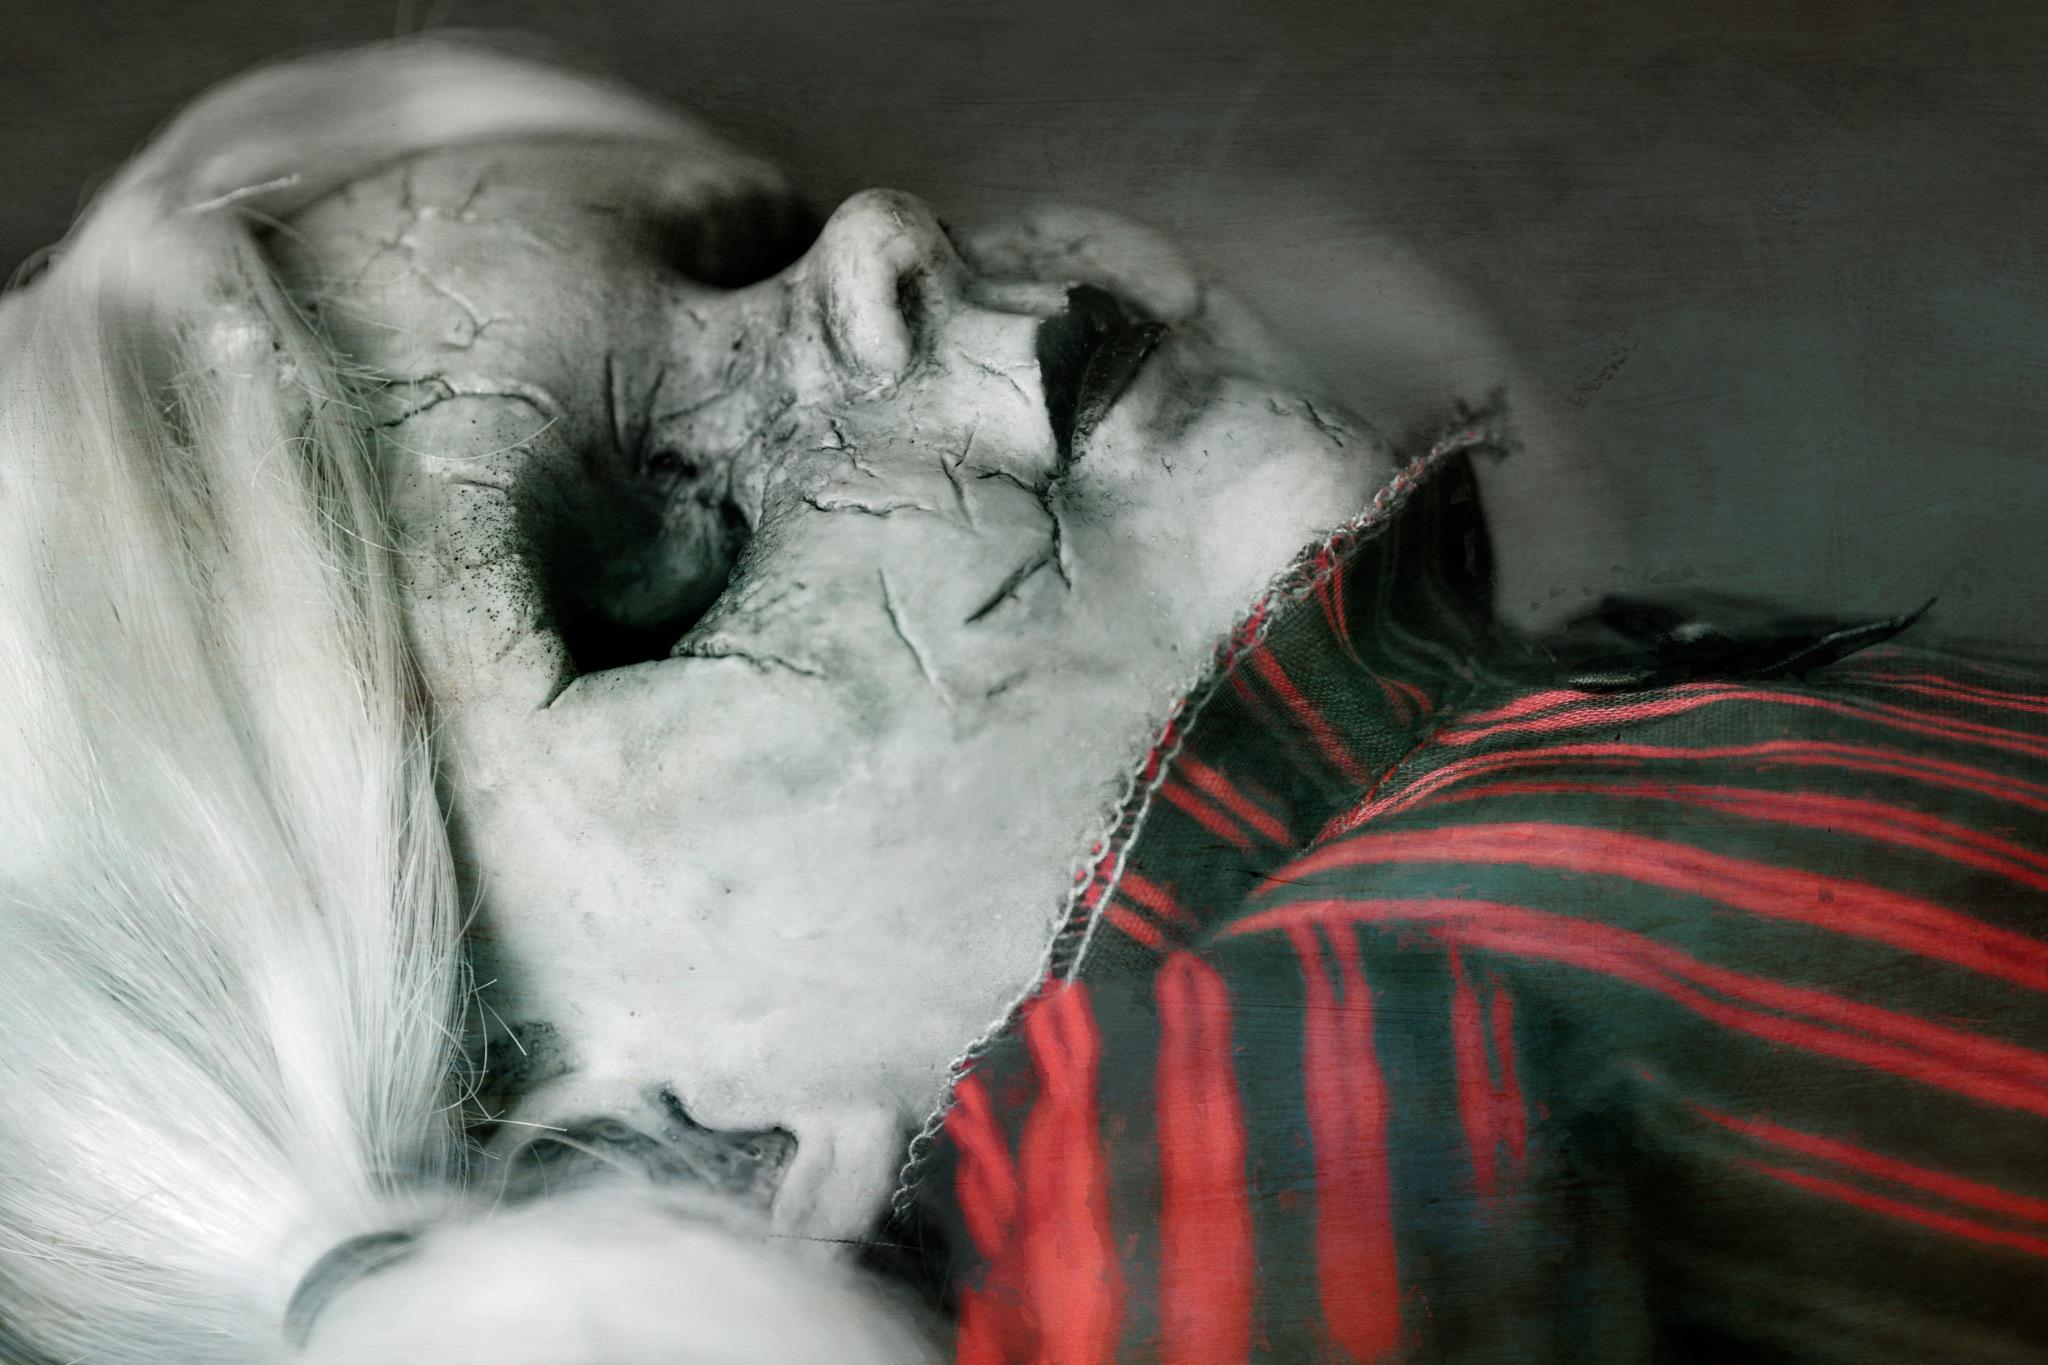 Diabolic Doll by sylviecorriveau